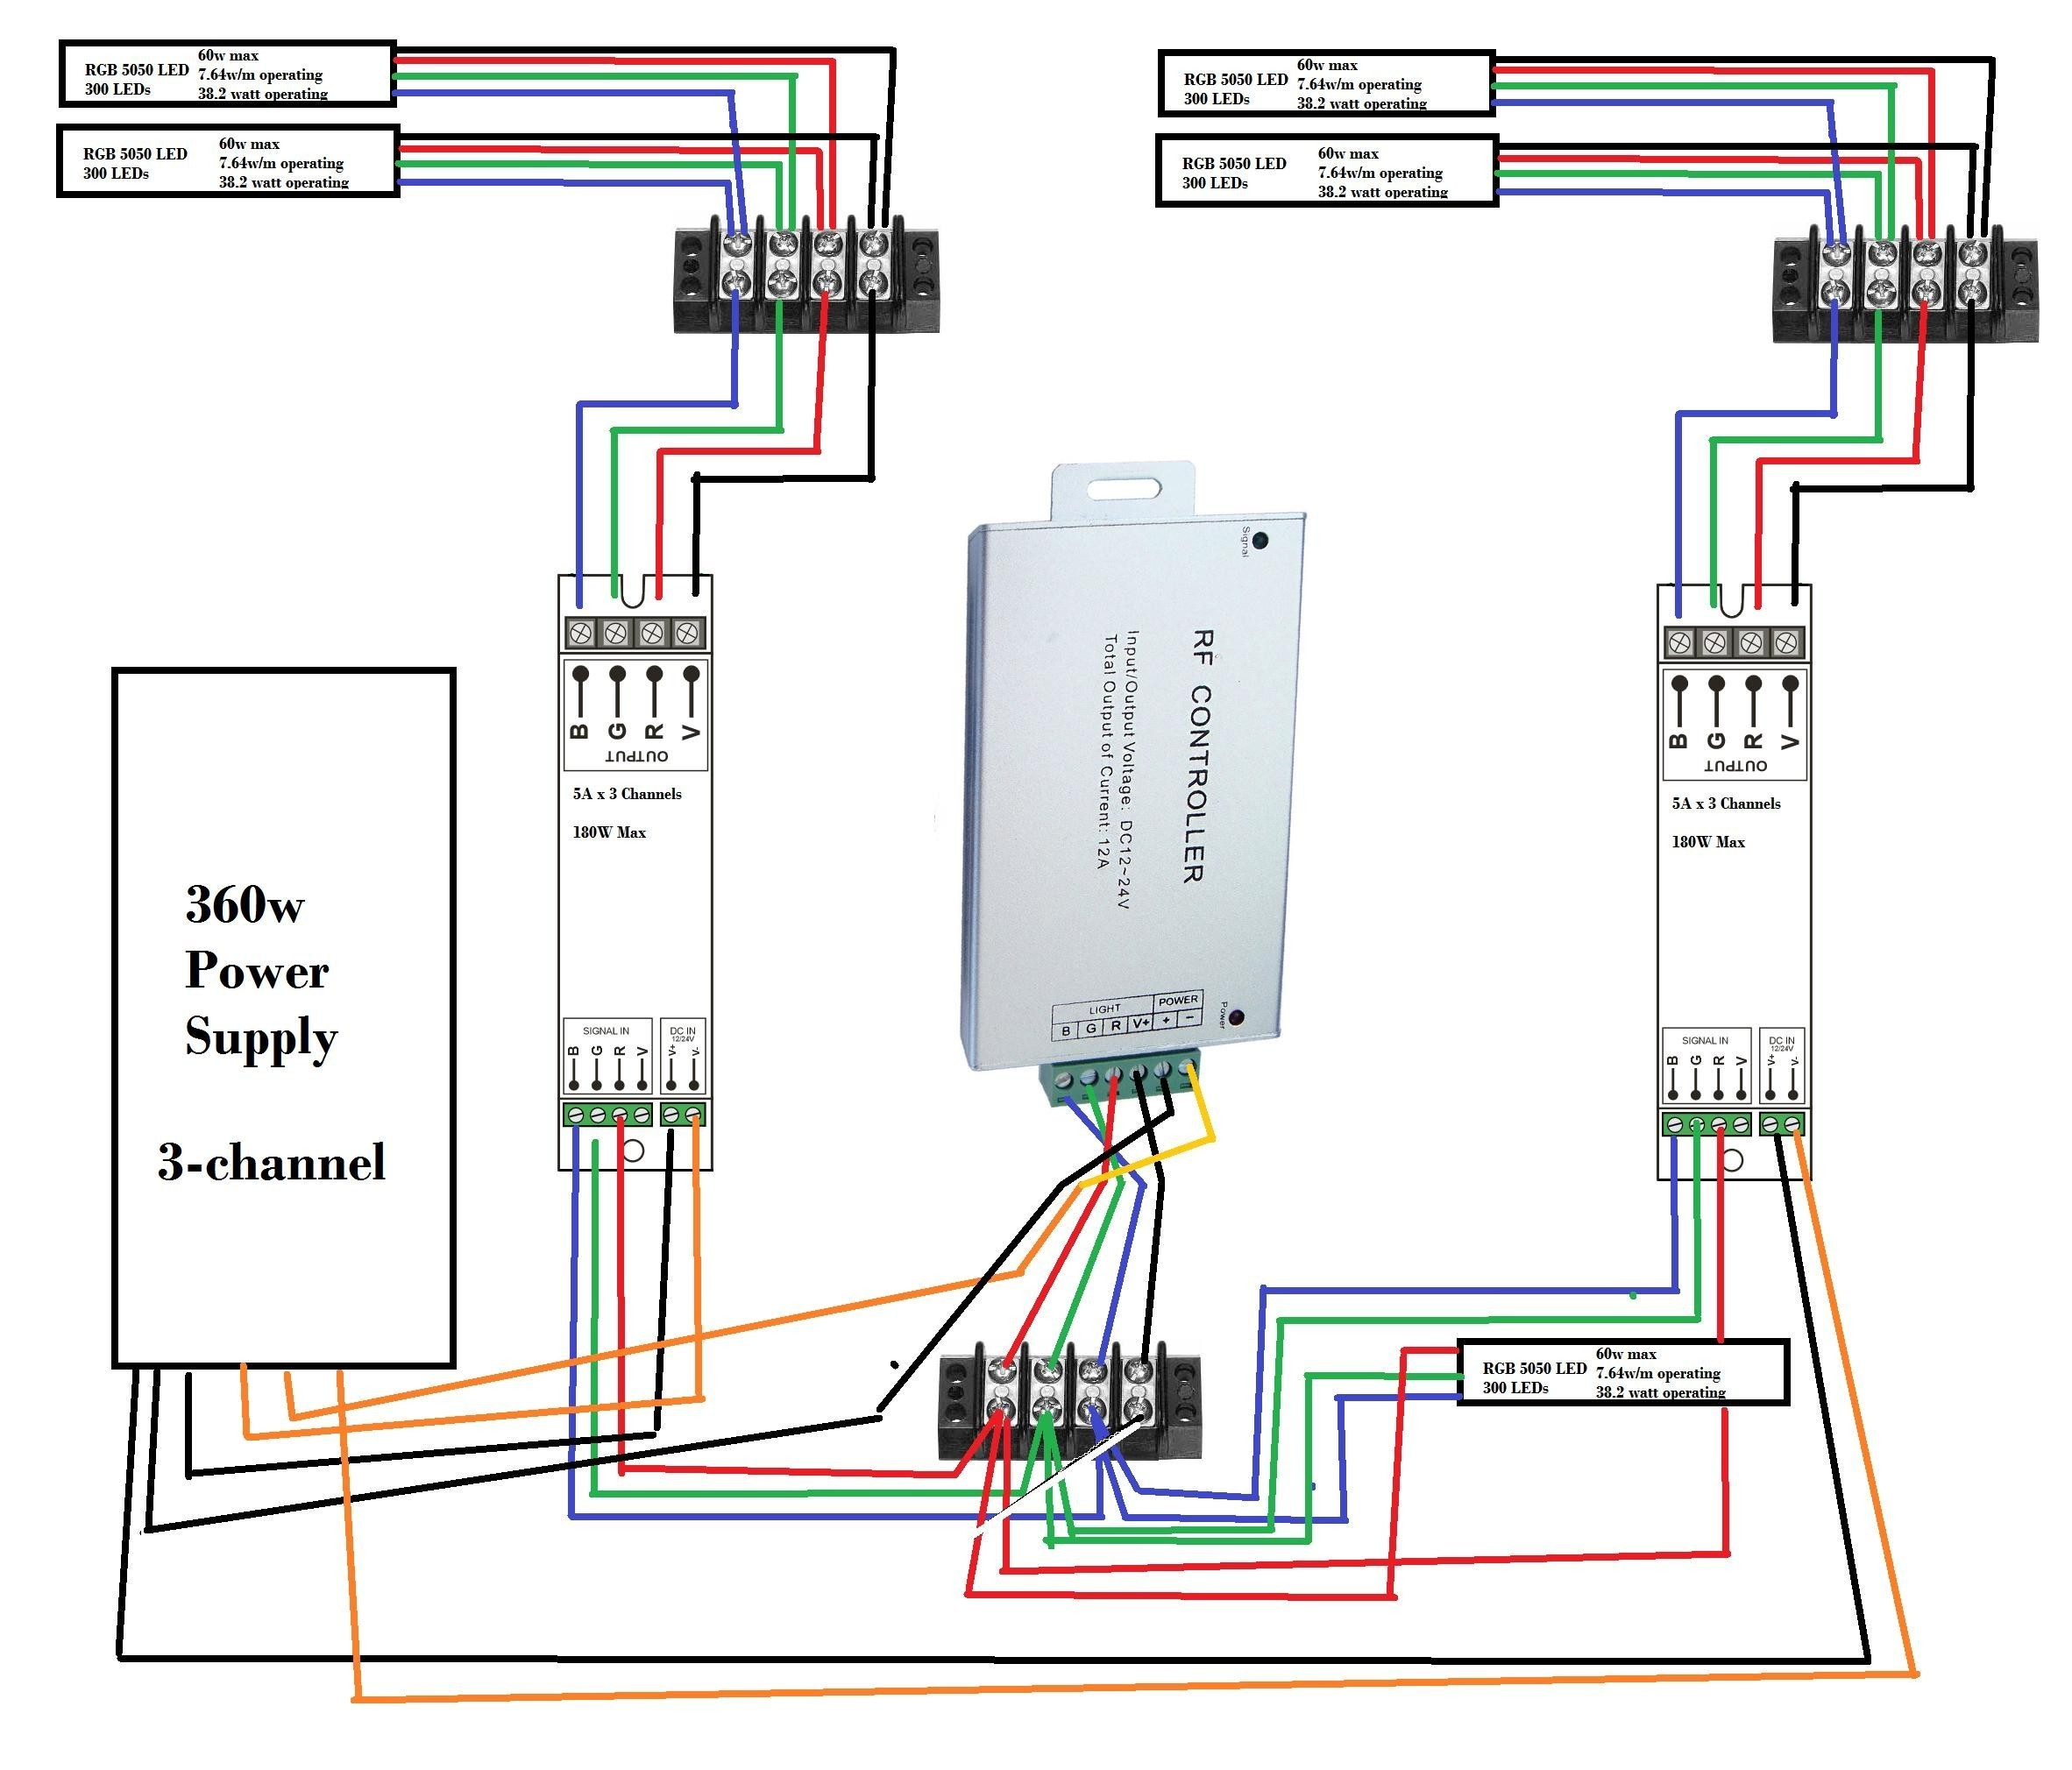 Wiring Diagram for Led Strip Lighting Valid New Wiring Diagram for Led Strip Lights